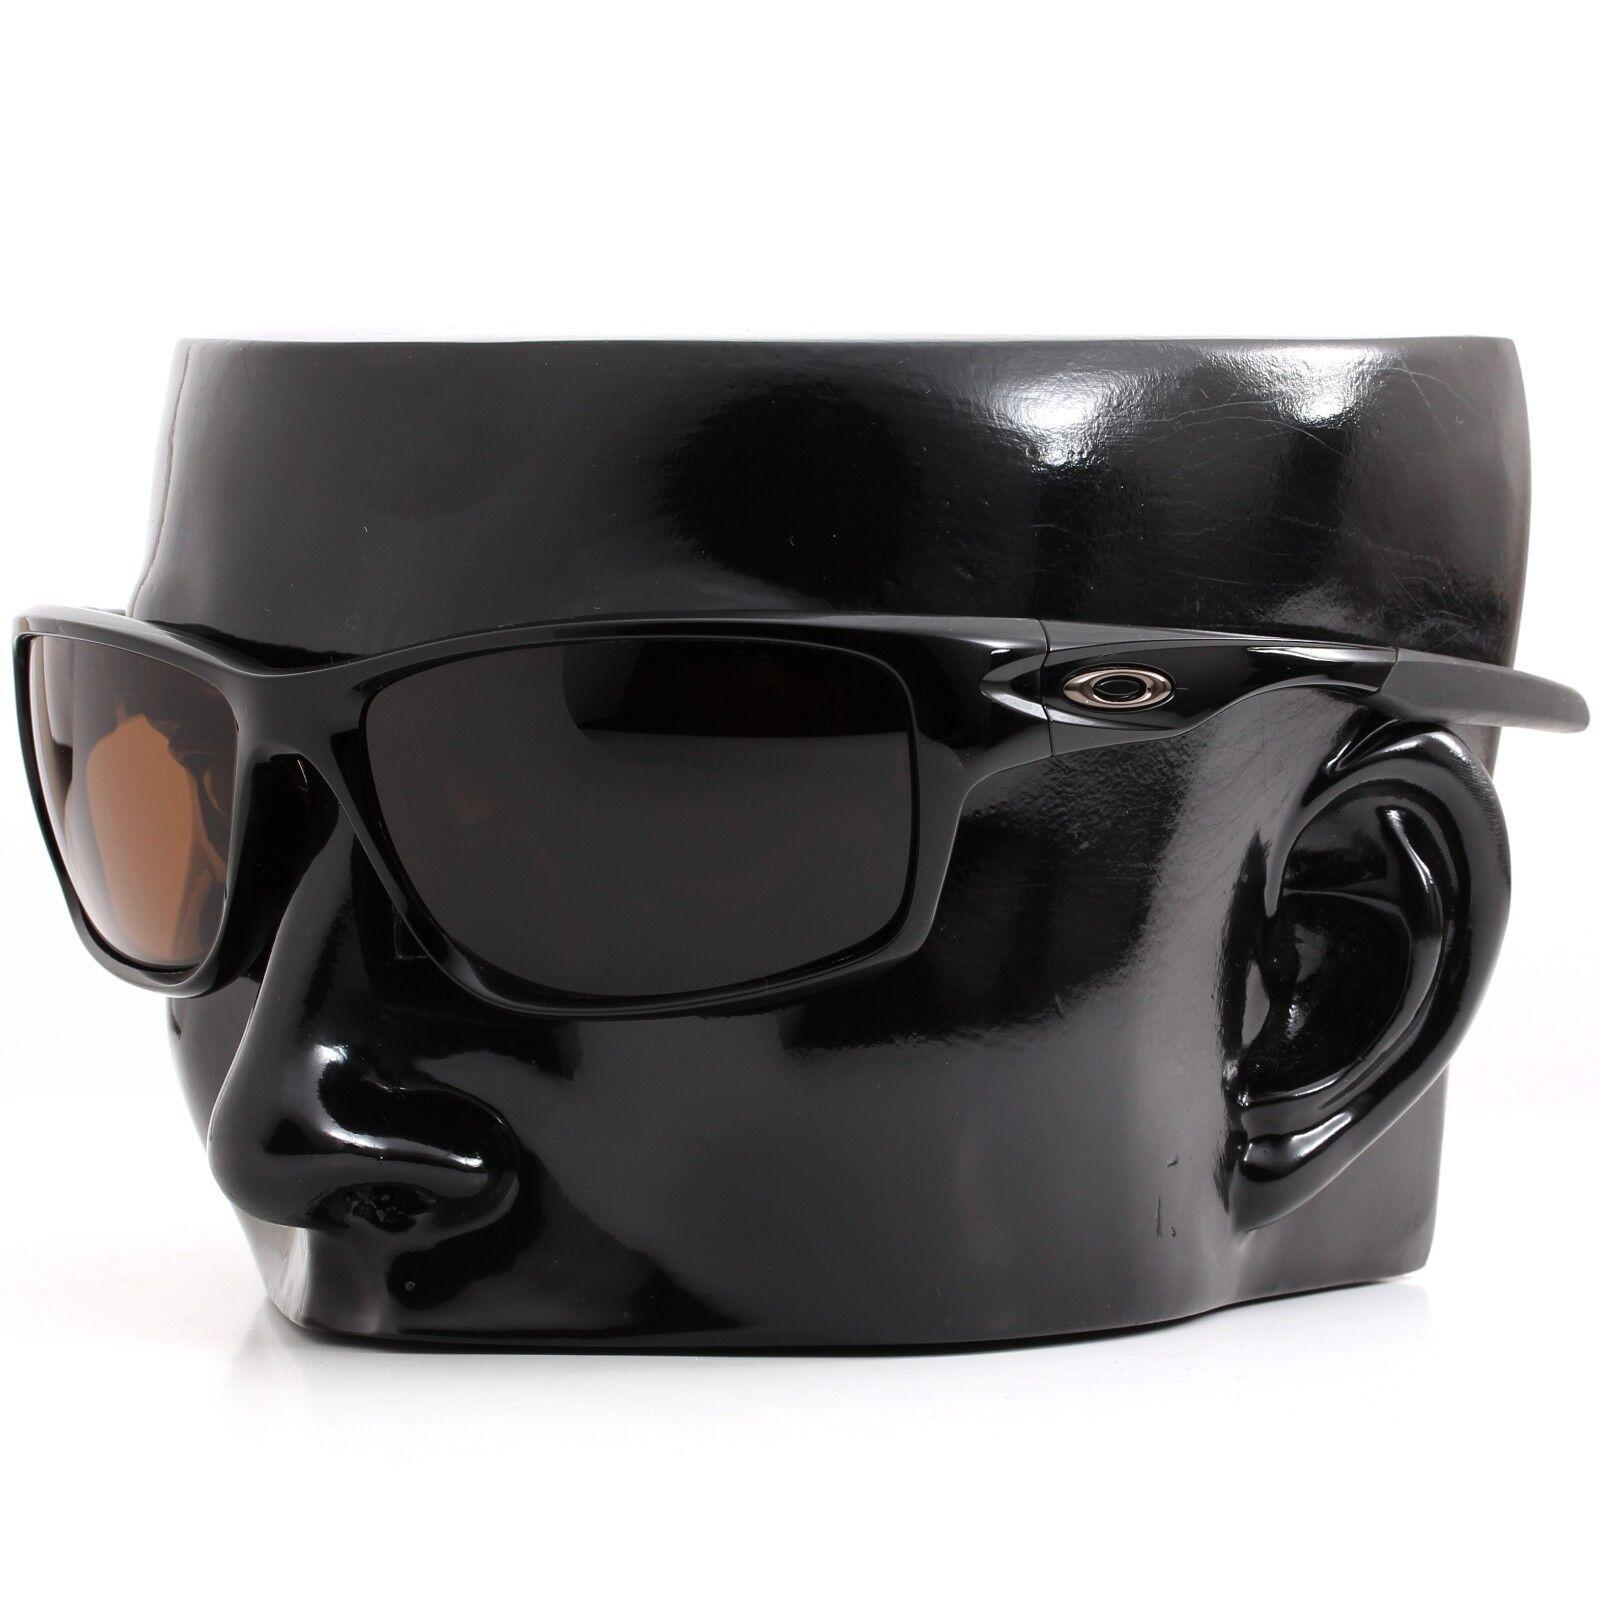 4ea129fdd0 Buy Polarized Ikon Replacement Lenses for Oakley Canteen 2014 ...